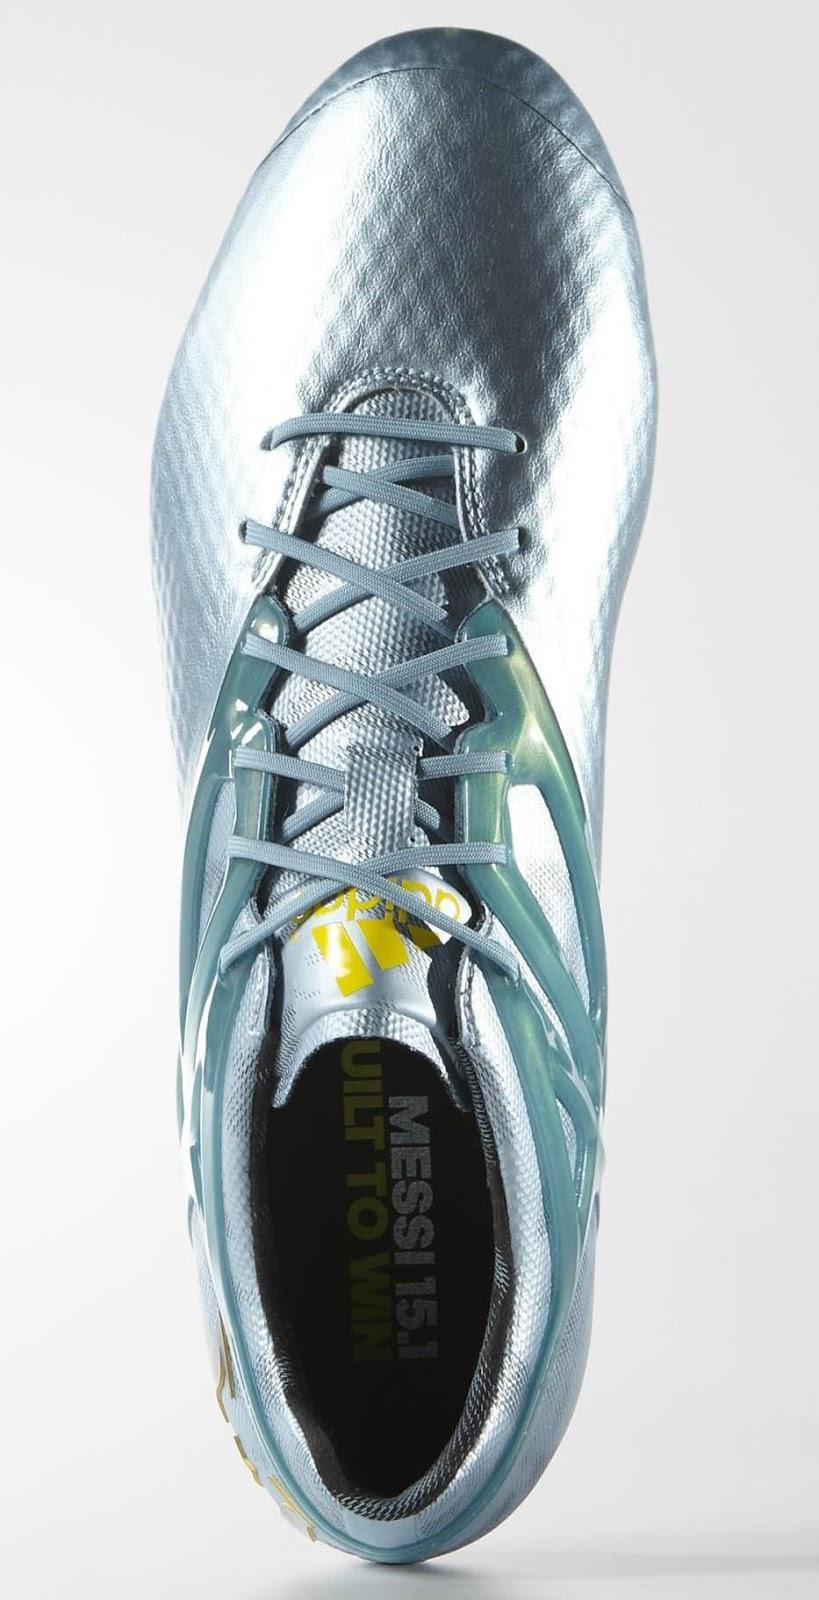 5b8a03072 Compare Adidas Messi 15 Boots - Adidas Messi 15.1 vs Messi 15.2 vs ...